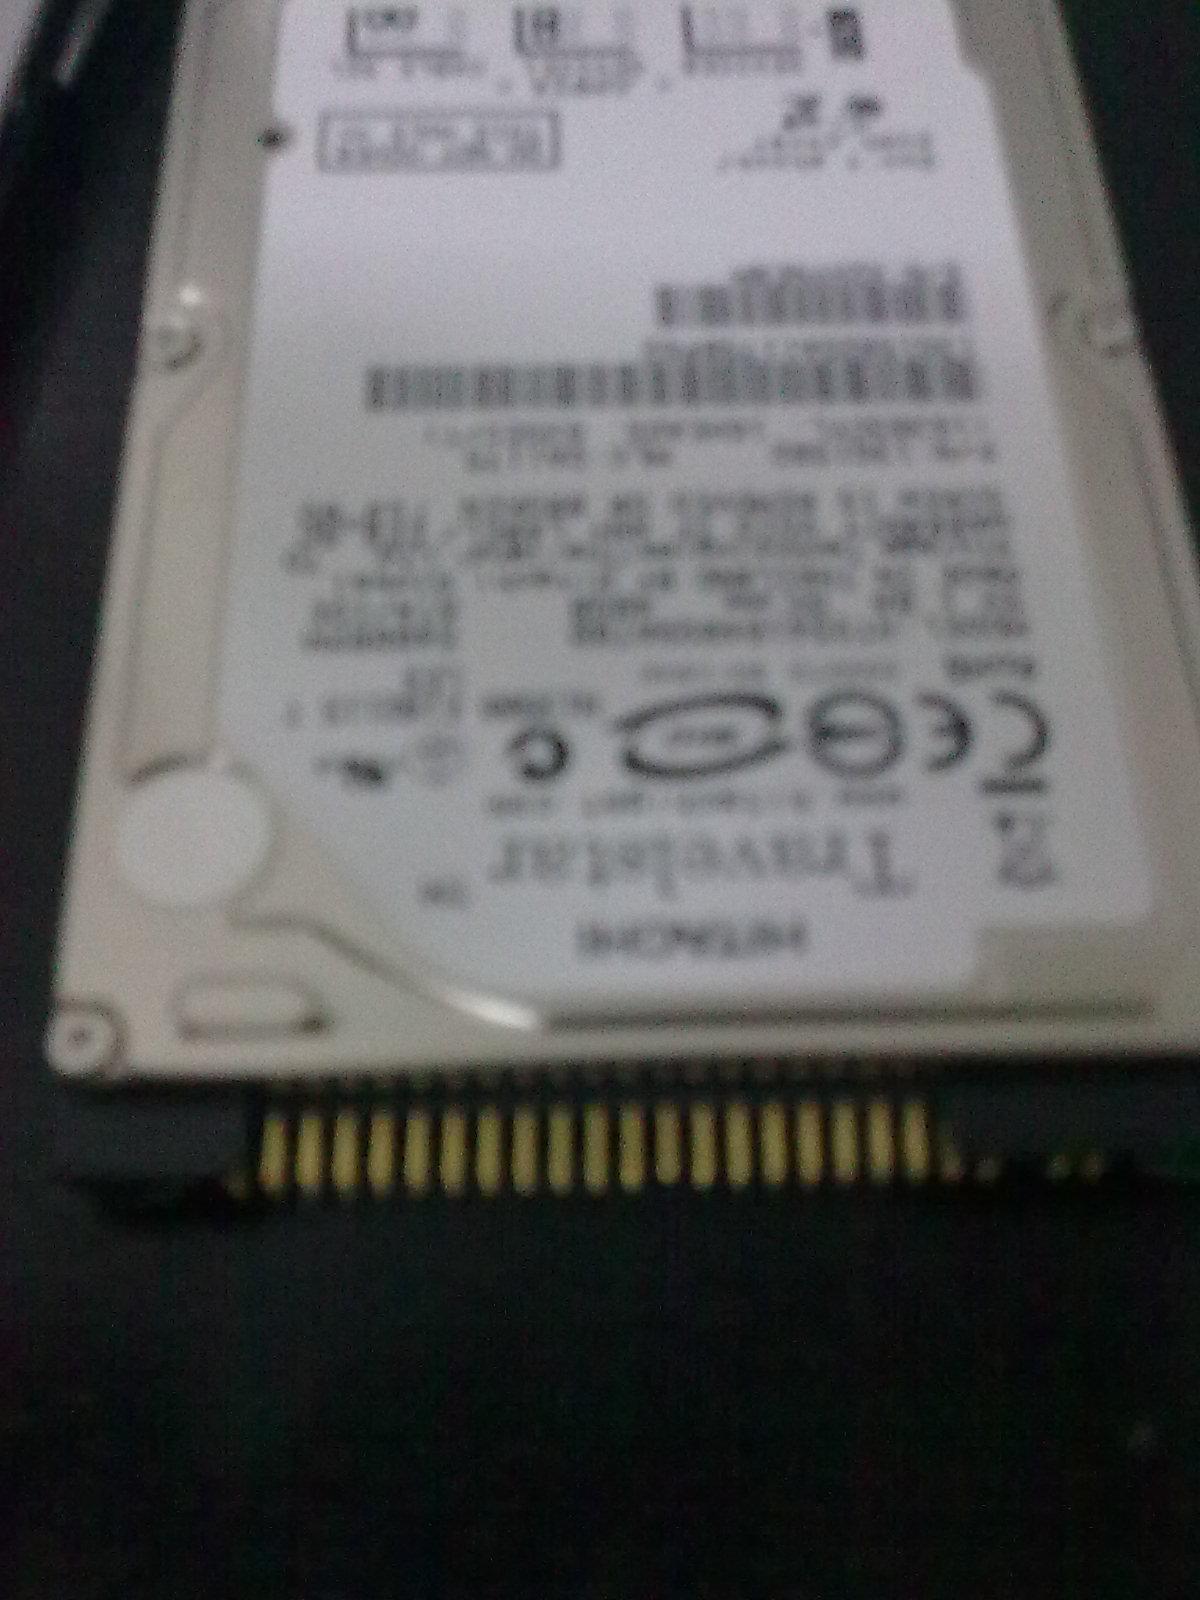 Simply Cheap Sata Ide Notebook Desktop Hard Disk Hardisk Laptop 25 120gb Zif Socket Rm200